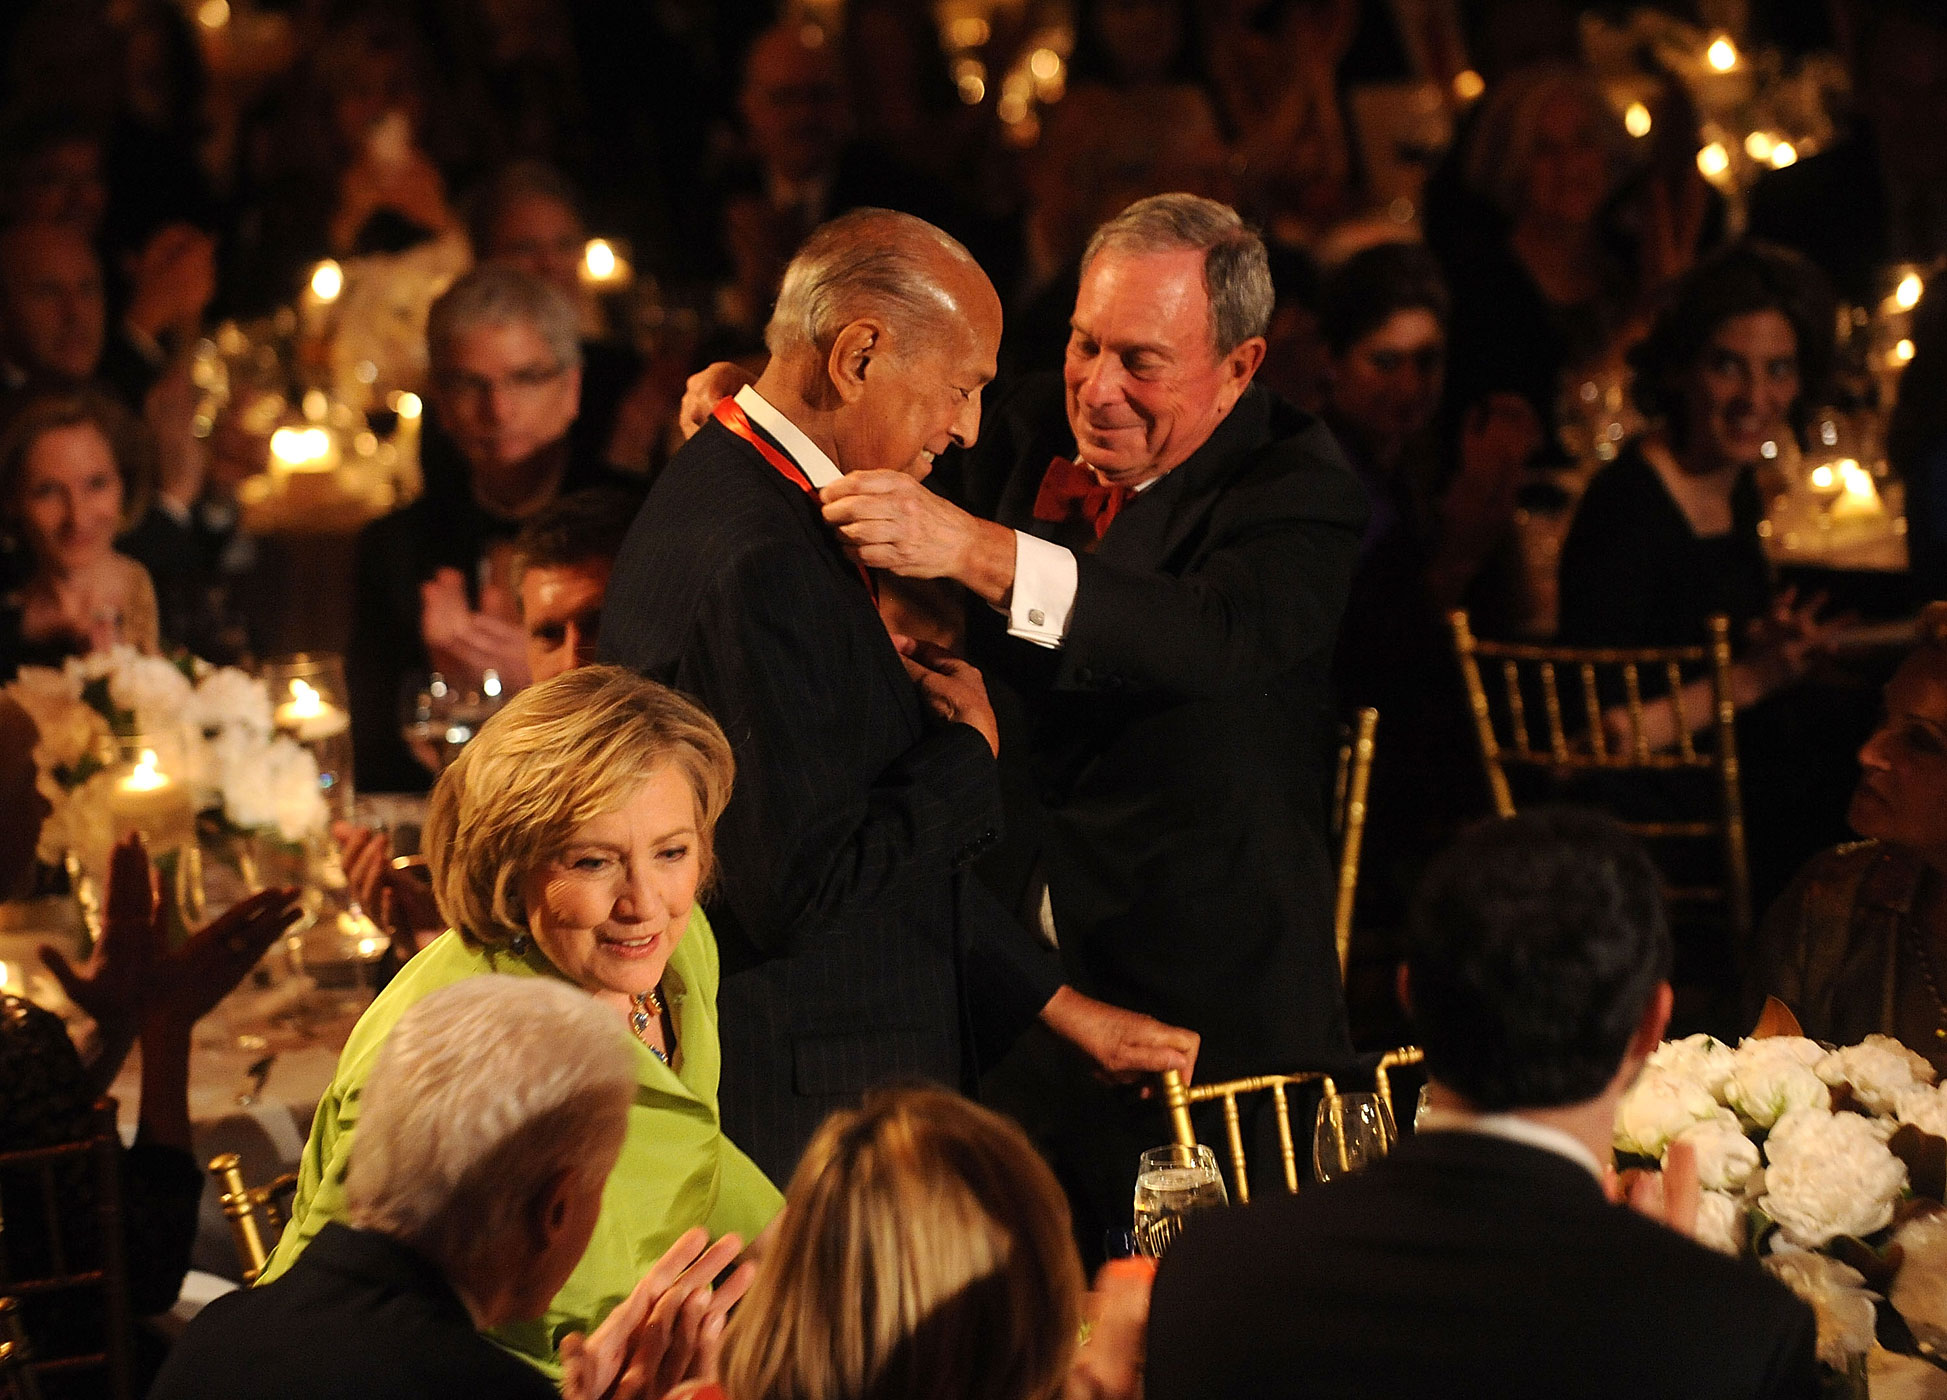 Designer Oscar de la Renta and Michael R. Bloomberg attend the 2014 Carnegie Hall Medal Of Excellence Gala Honoring Oscar De La Renta at The Plaza Hotel on April 24, 2014 in New York City.